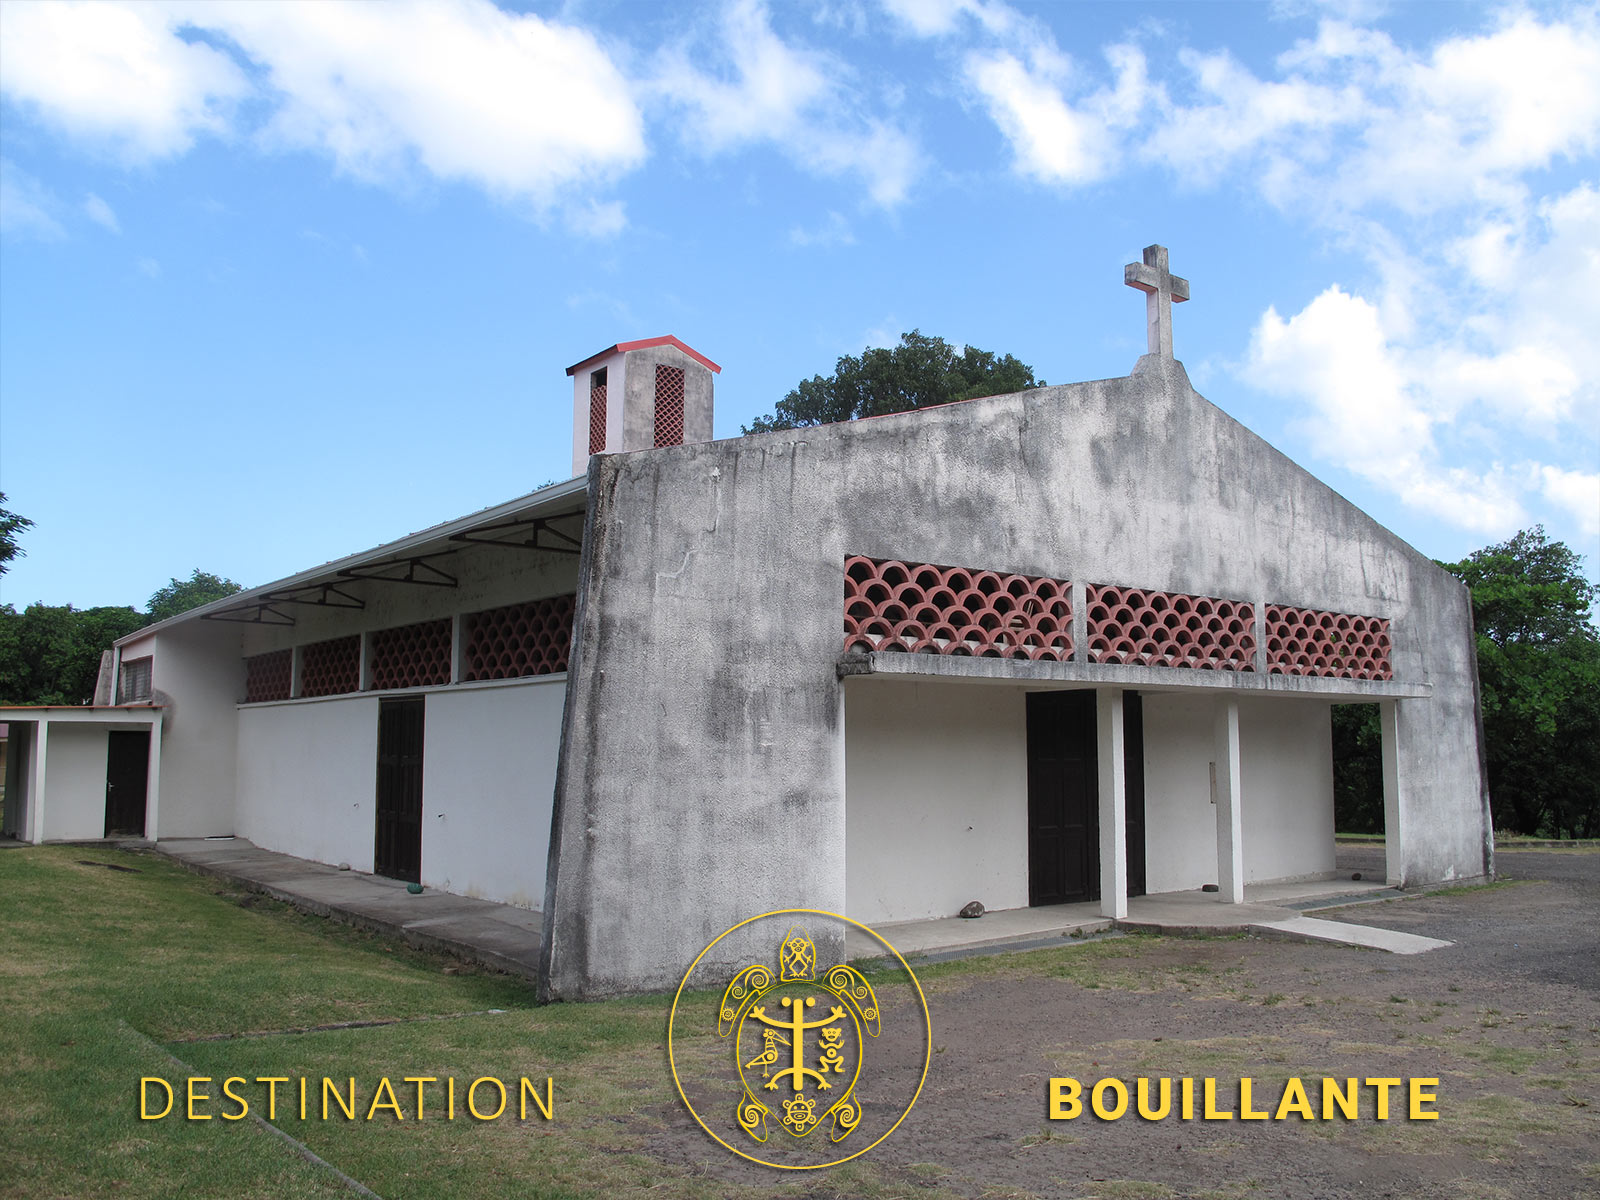 Eglise de Pigeon - Bouillante